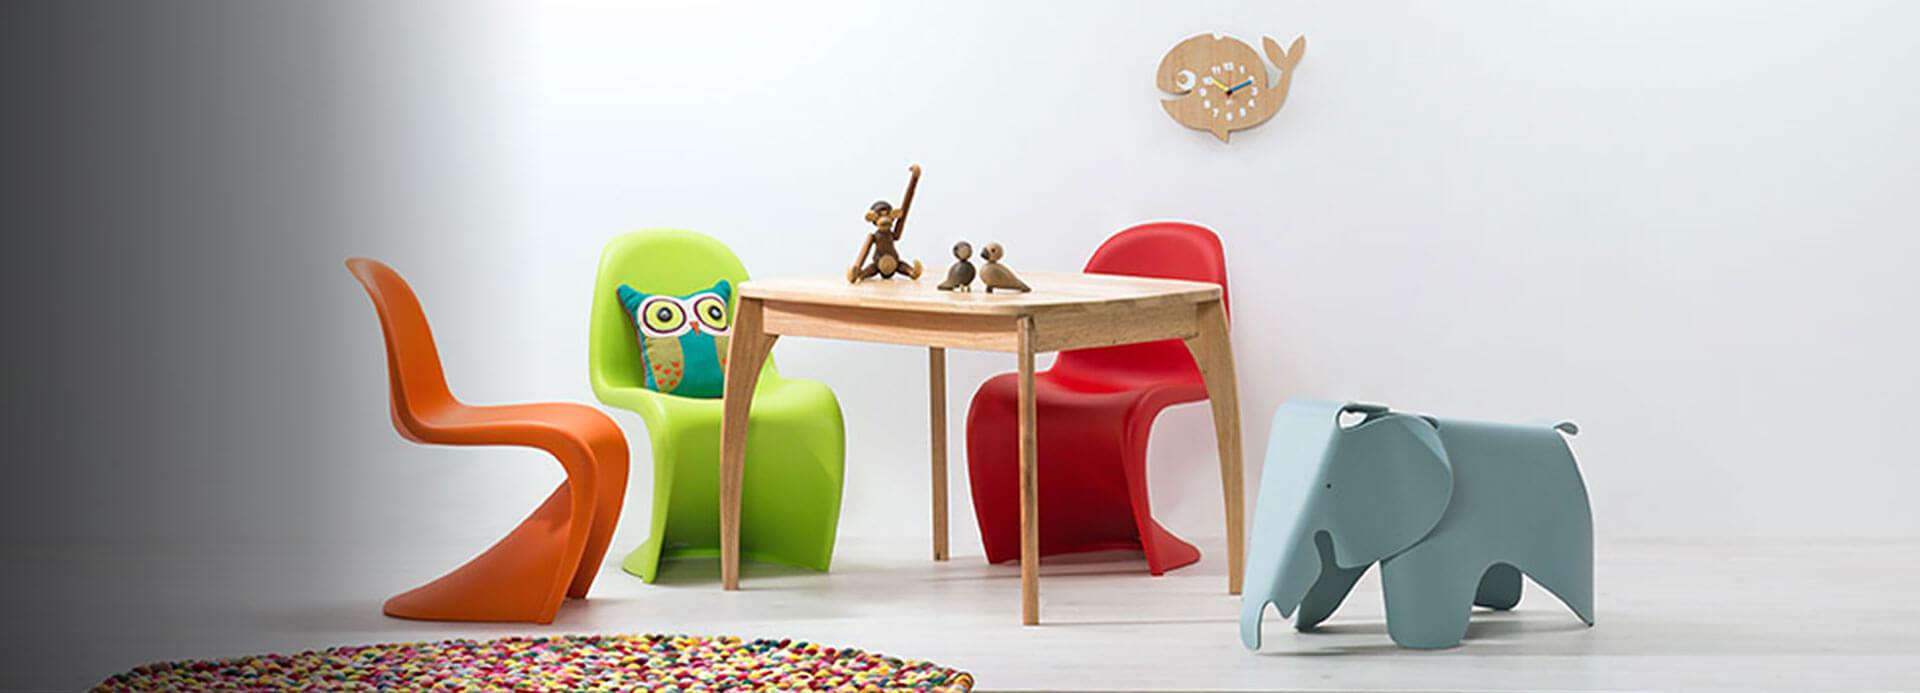 childrens furniture kidu0027s table savings LNOZRTG